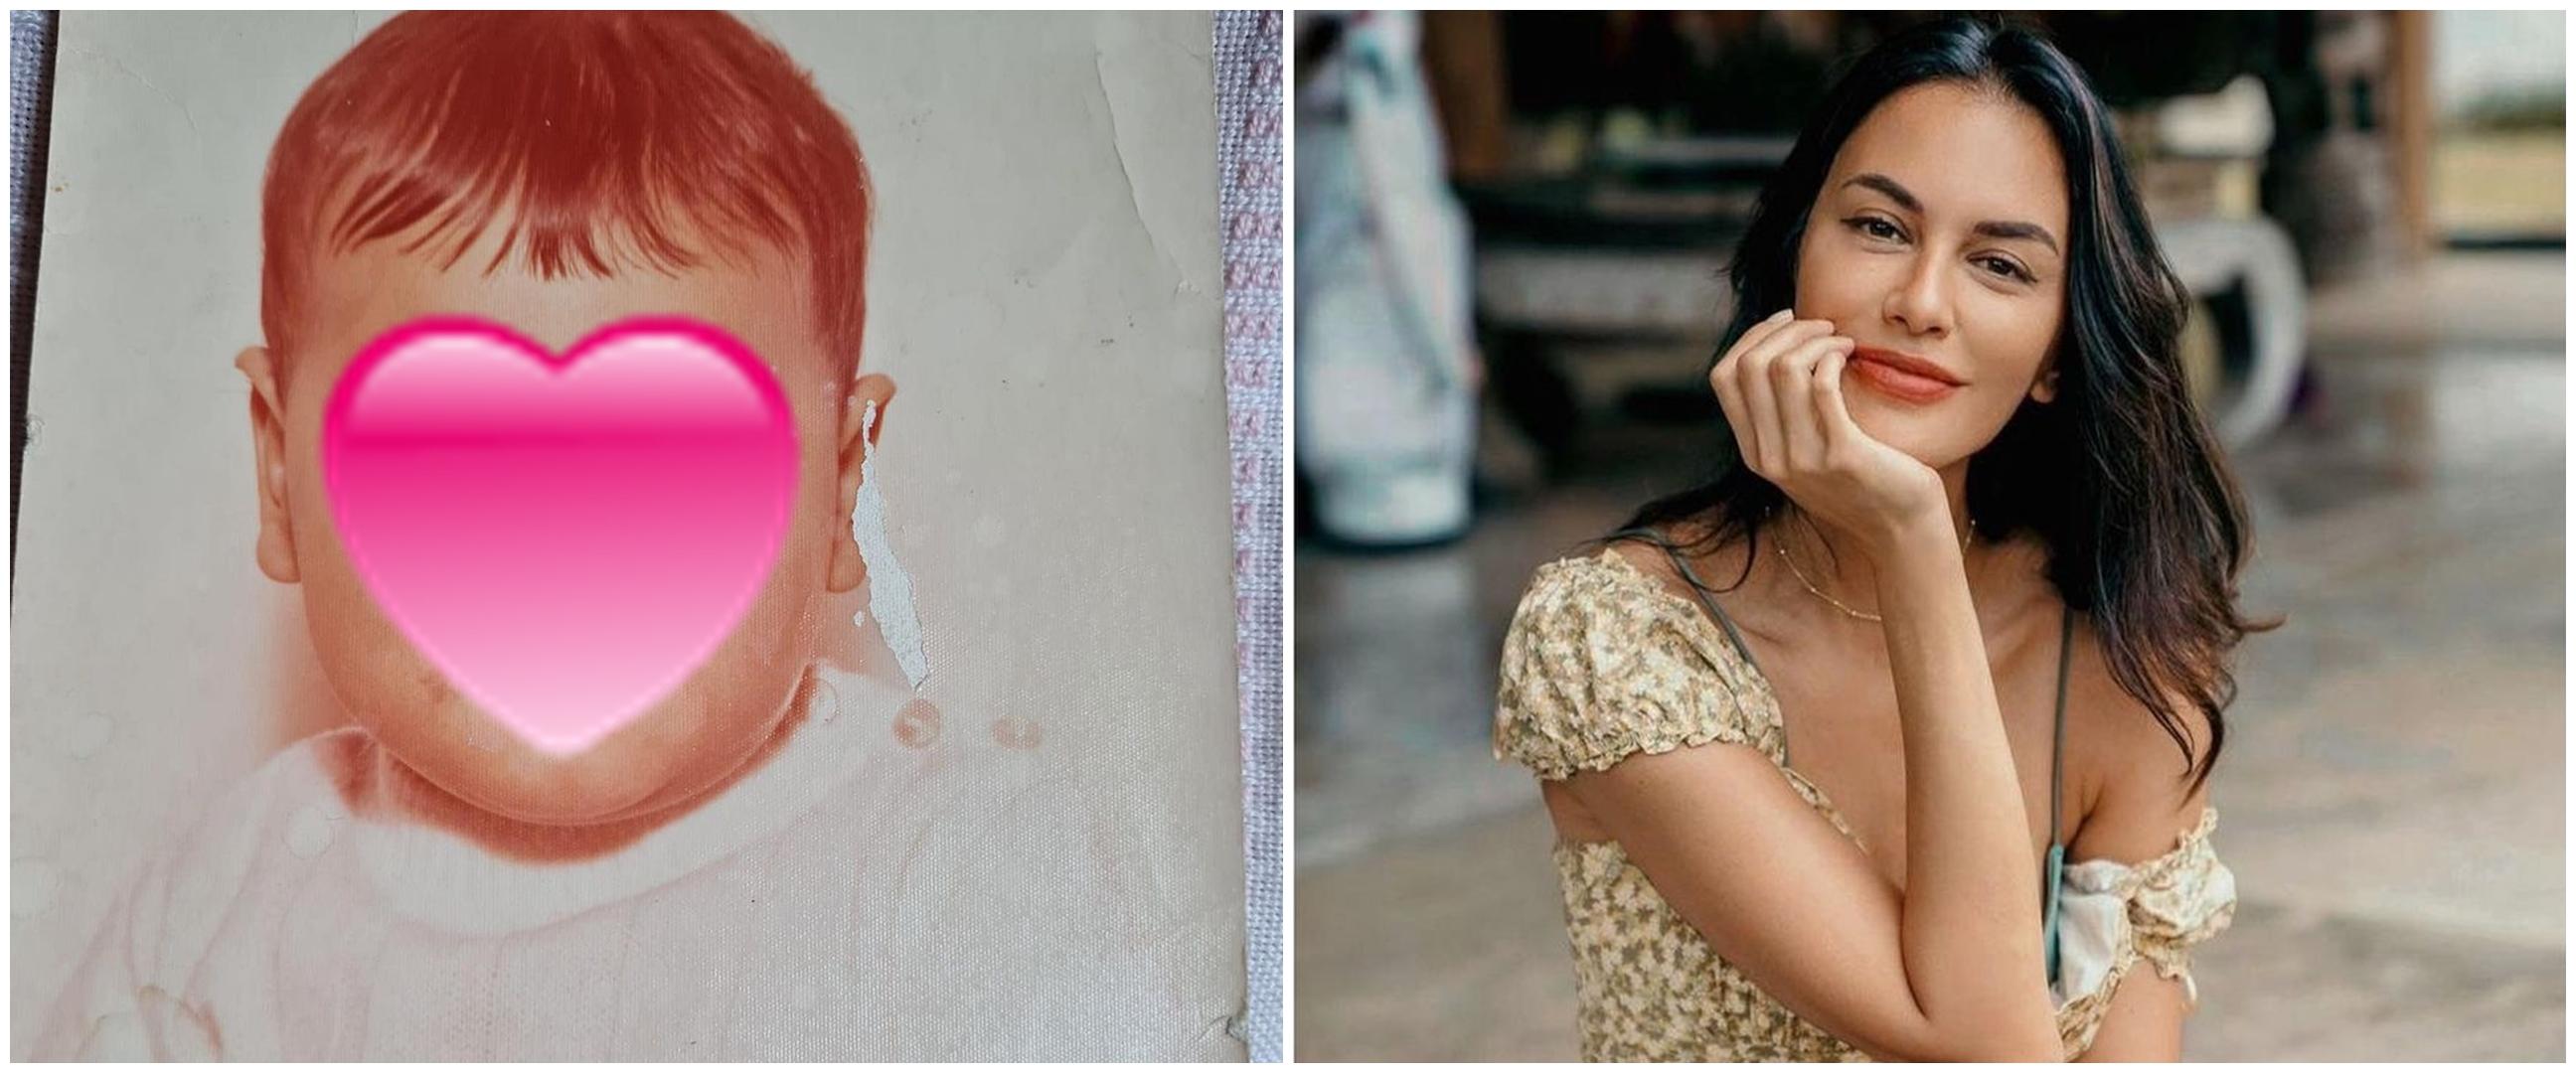 Unggah foto masih bayi, paras Sophia Latjuba ini bikin terkagum-kagum